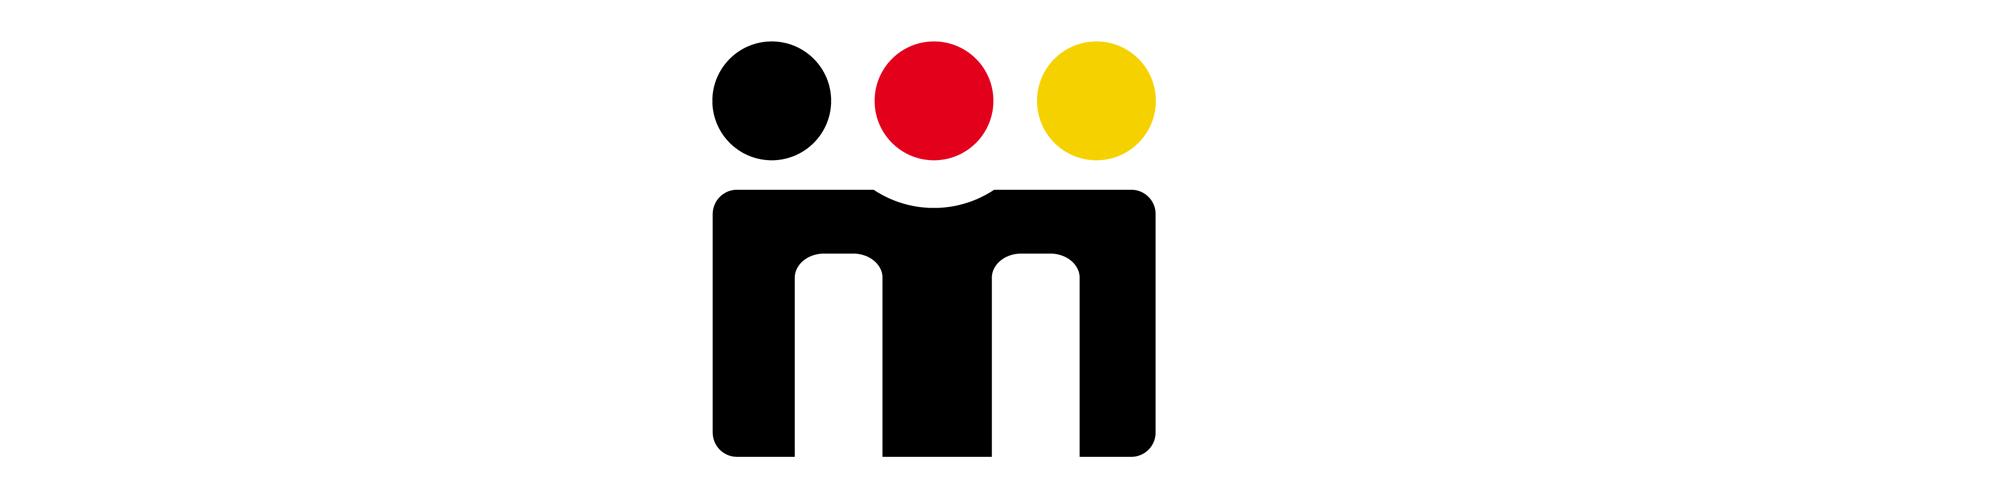 bergstromdesign.de_klassentreffen_logo1